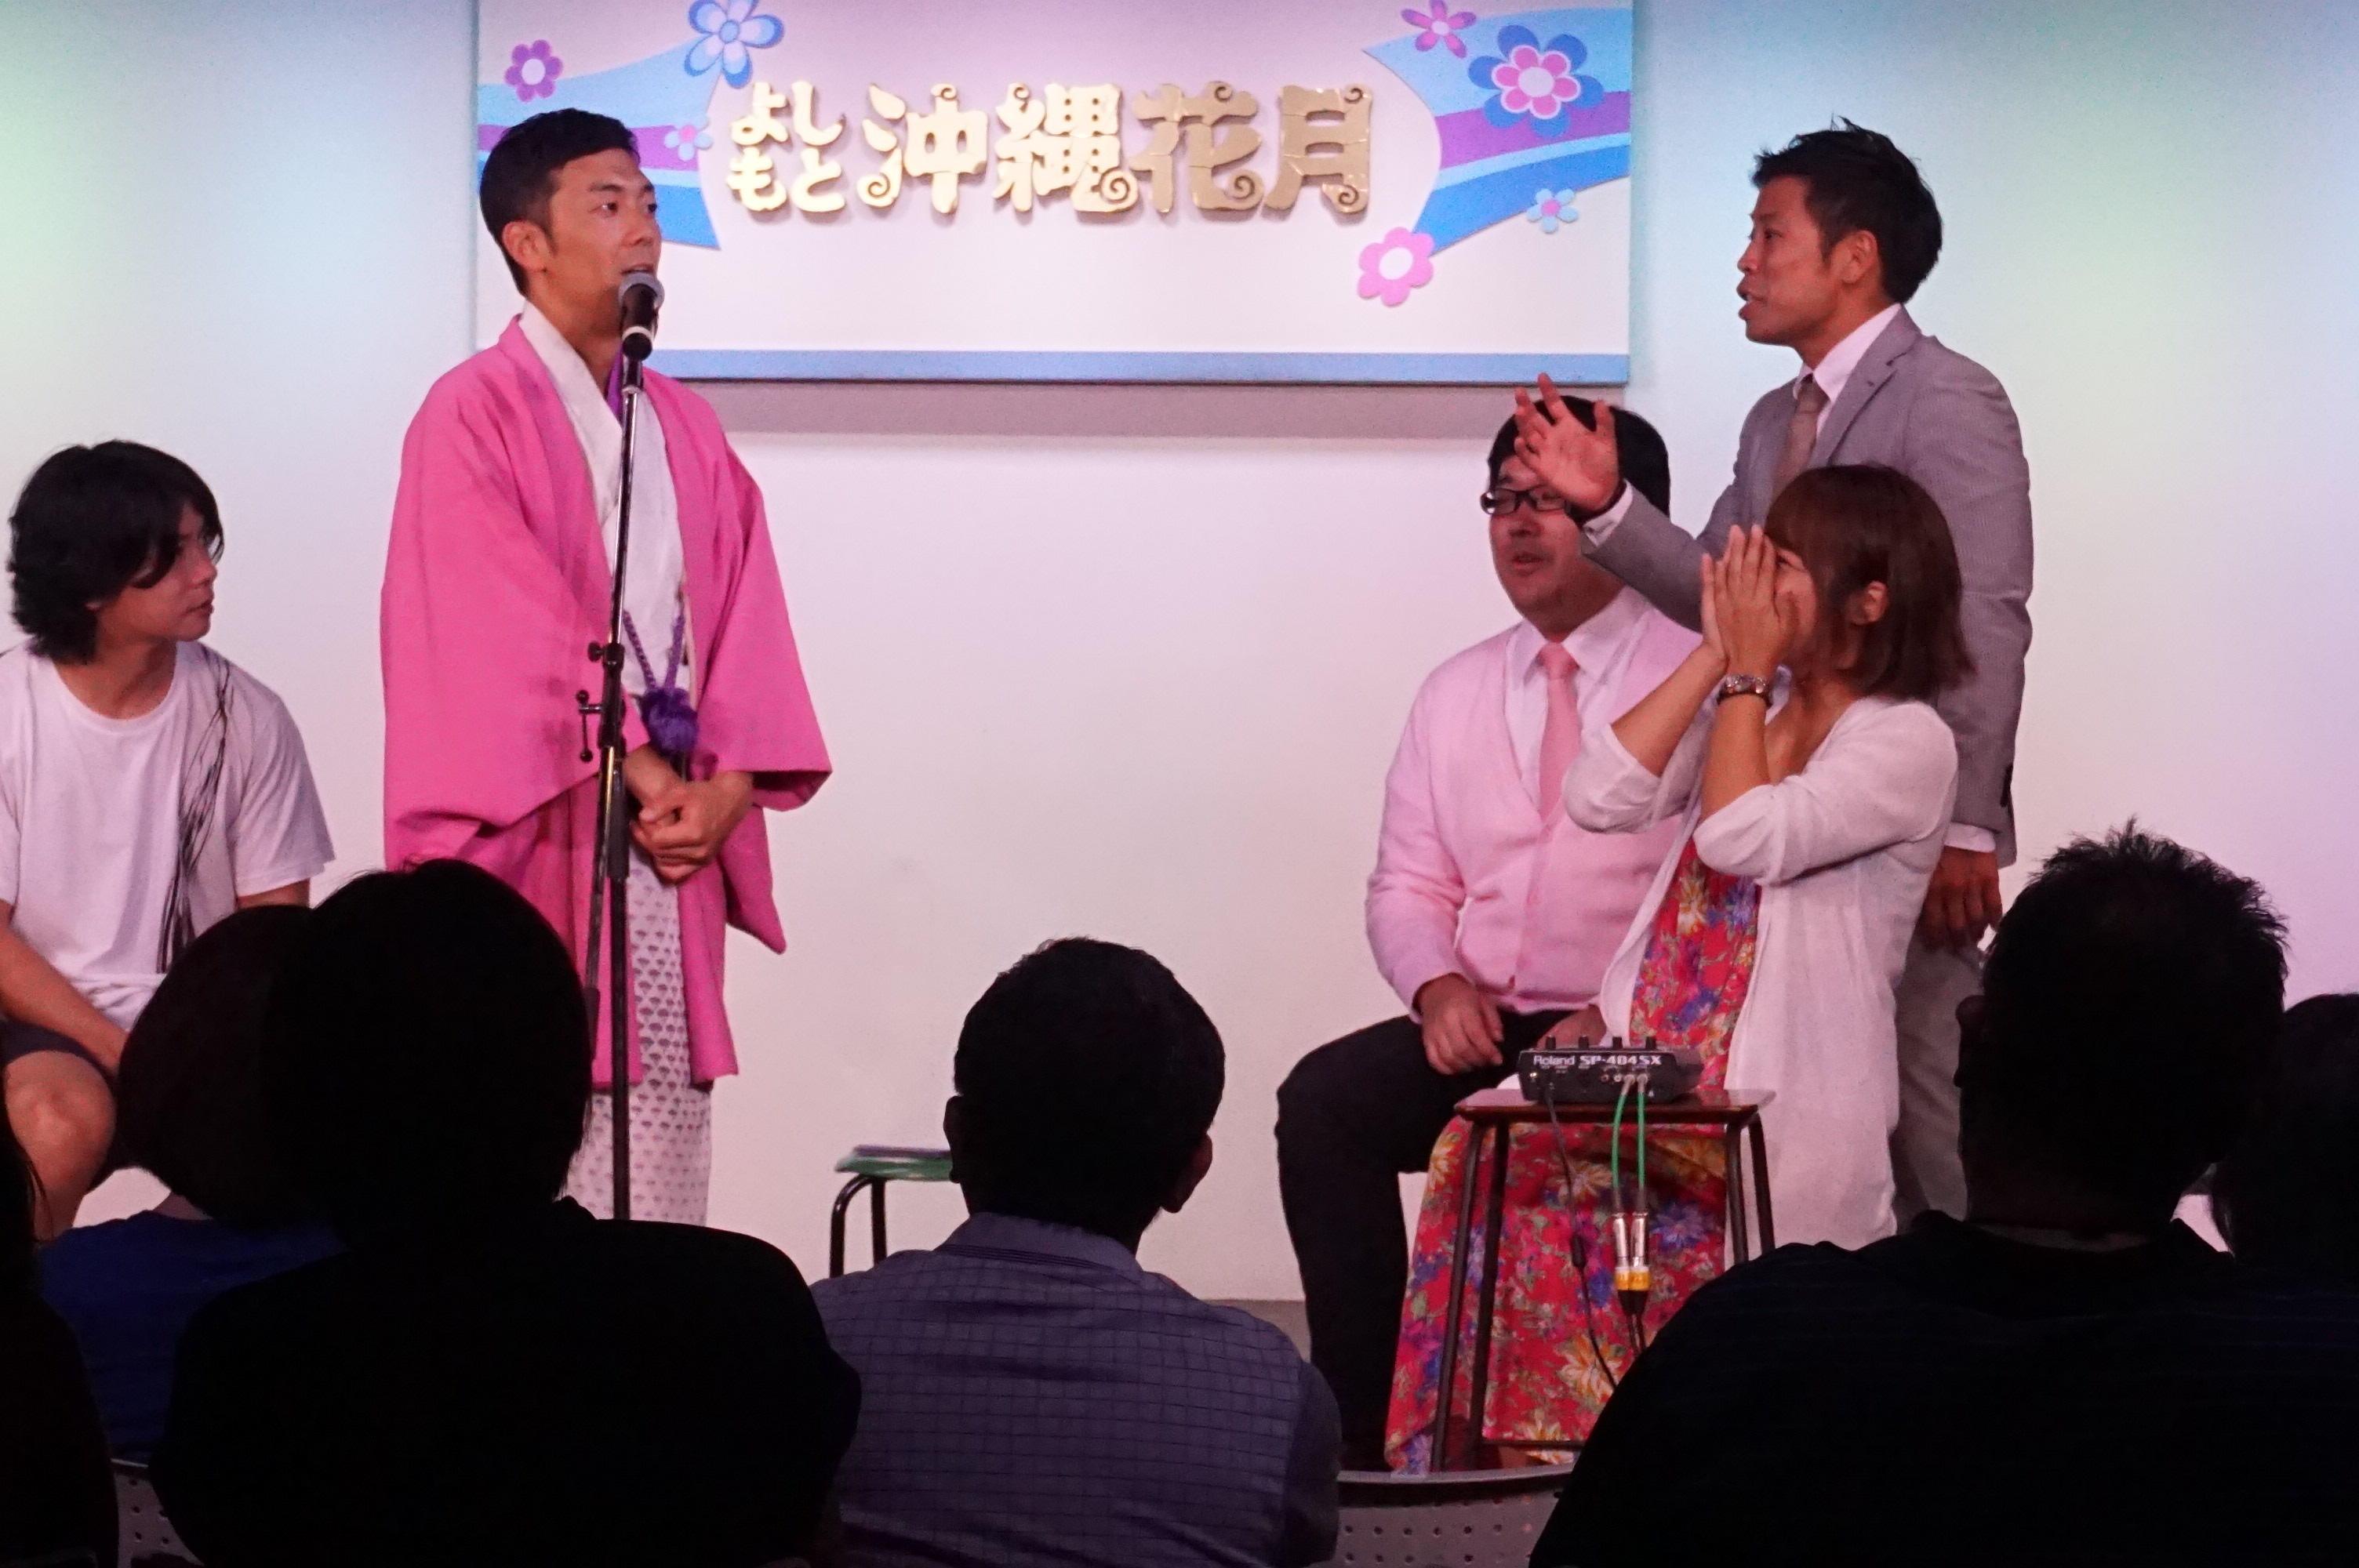 http://news.yoshimoto.co.jp/20180822203937-aef91538aee5535a893efa22126723270ee0f9fc.jpg